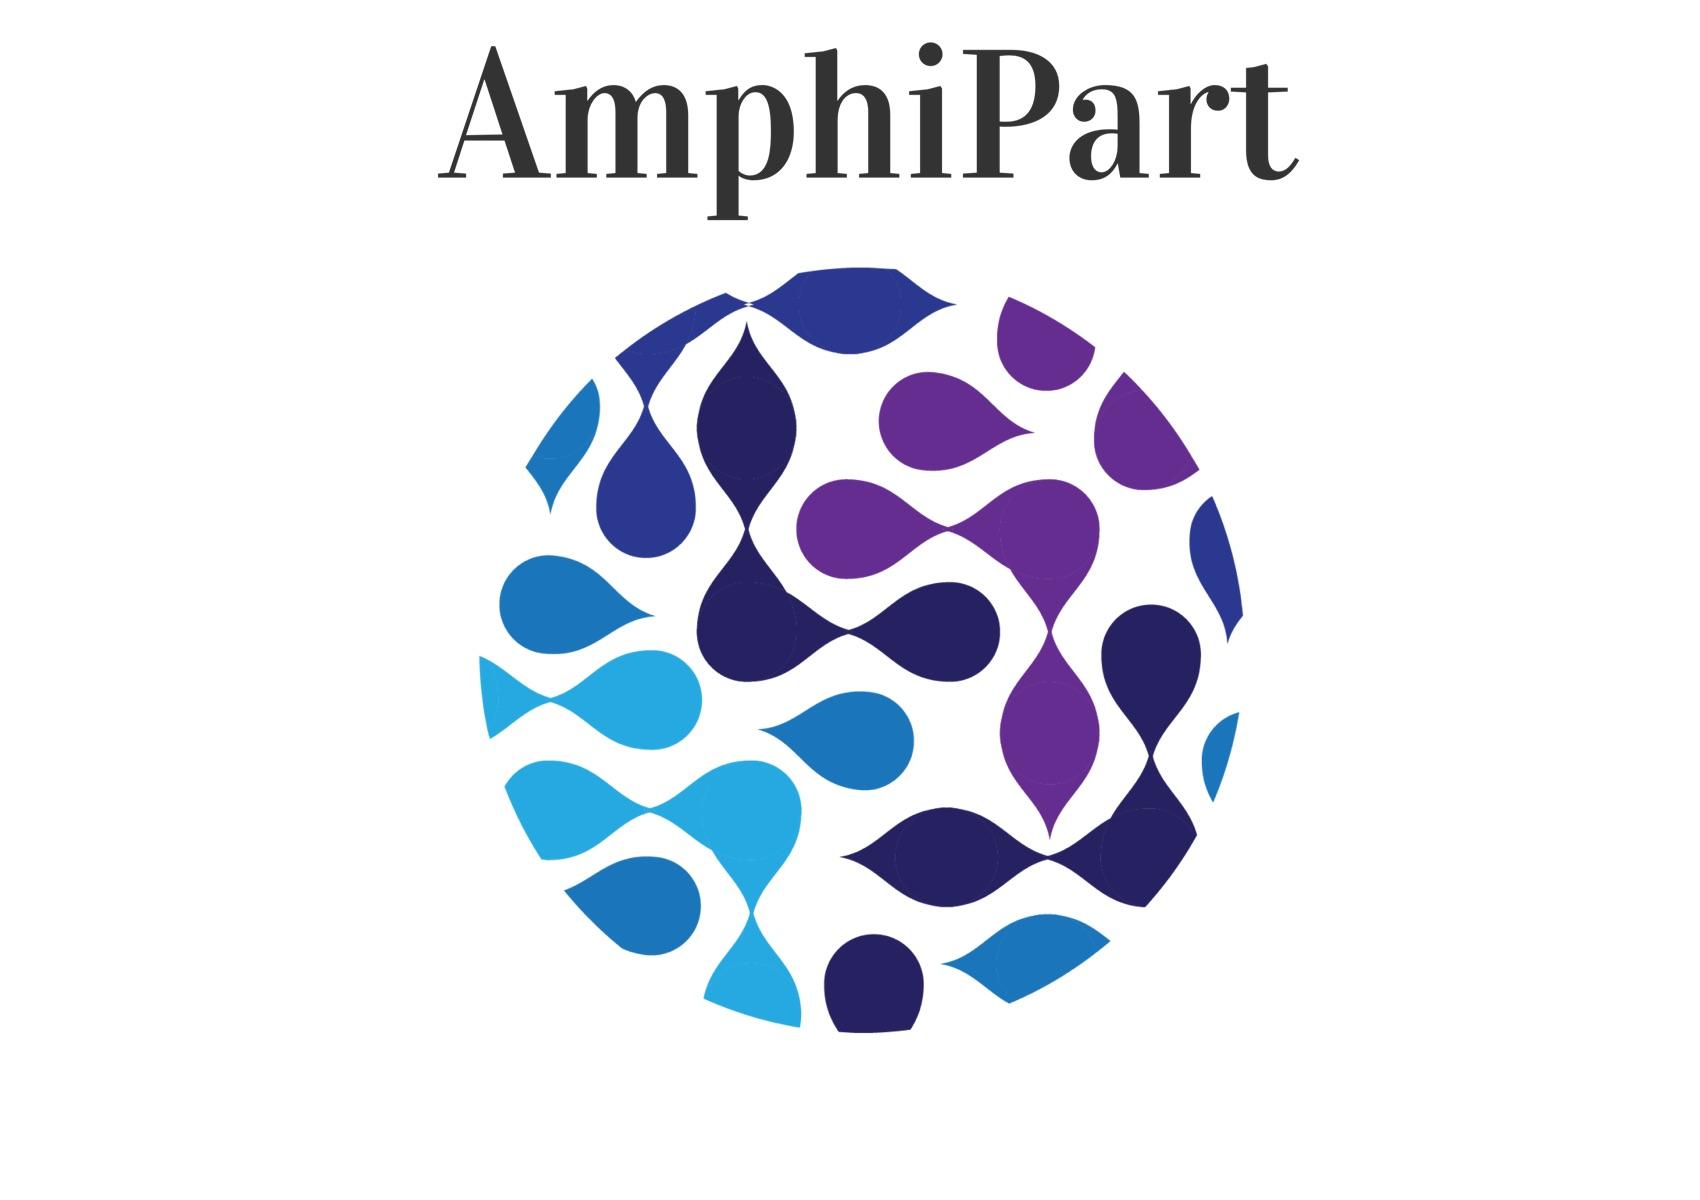 AmphiPart